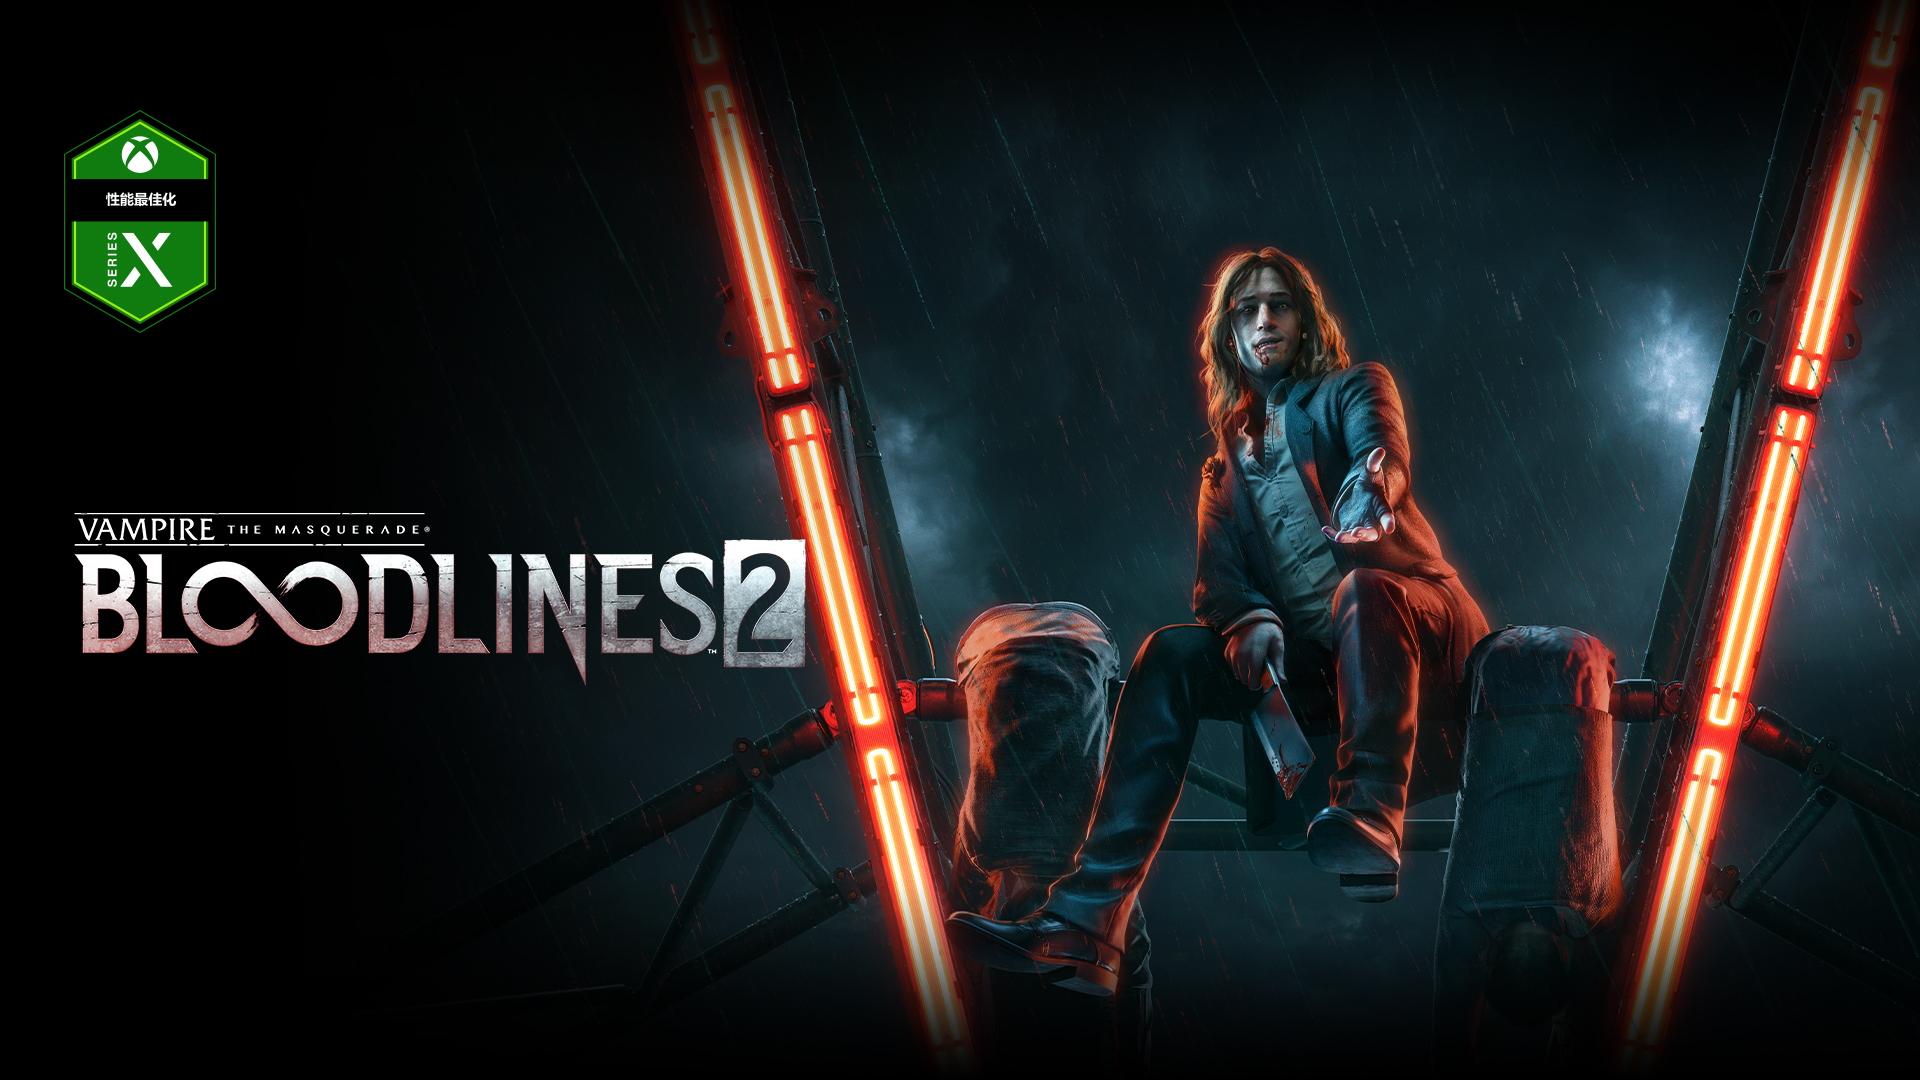 Vampire the Masquerade Bloodlines 2,有個吸血鬼坐在摩天輪輪輻上微笑著。